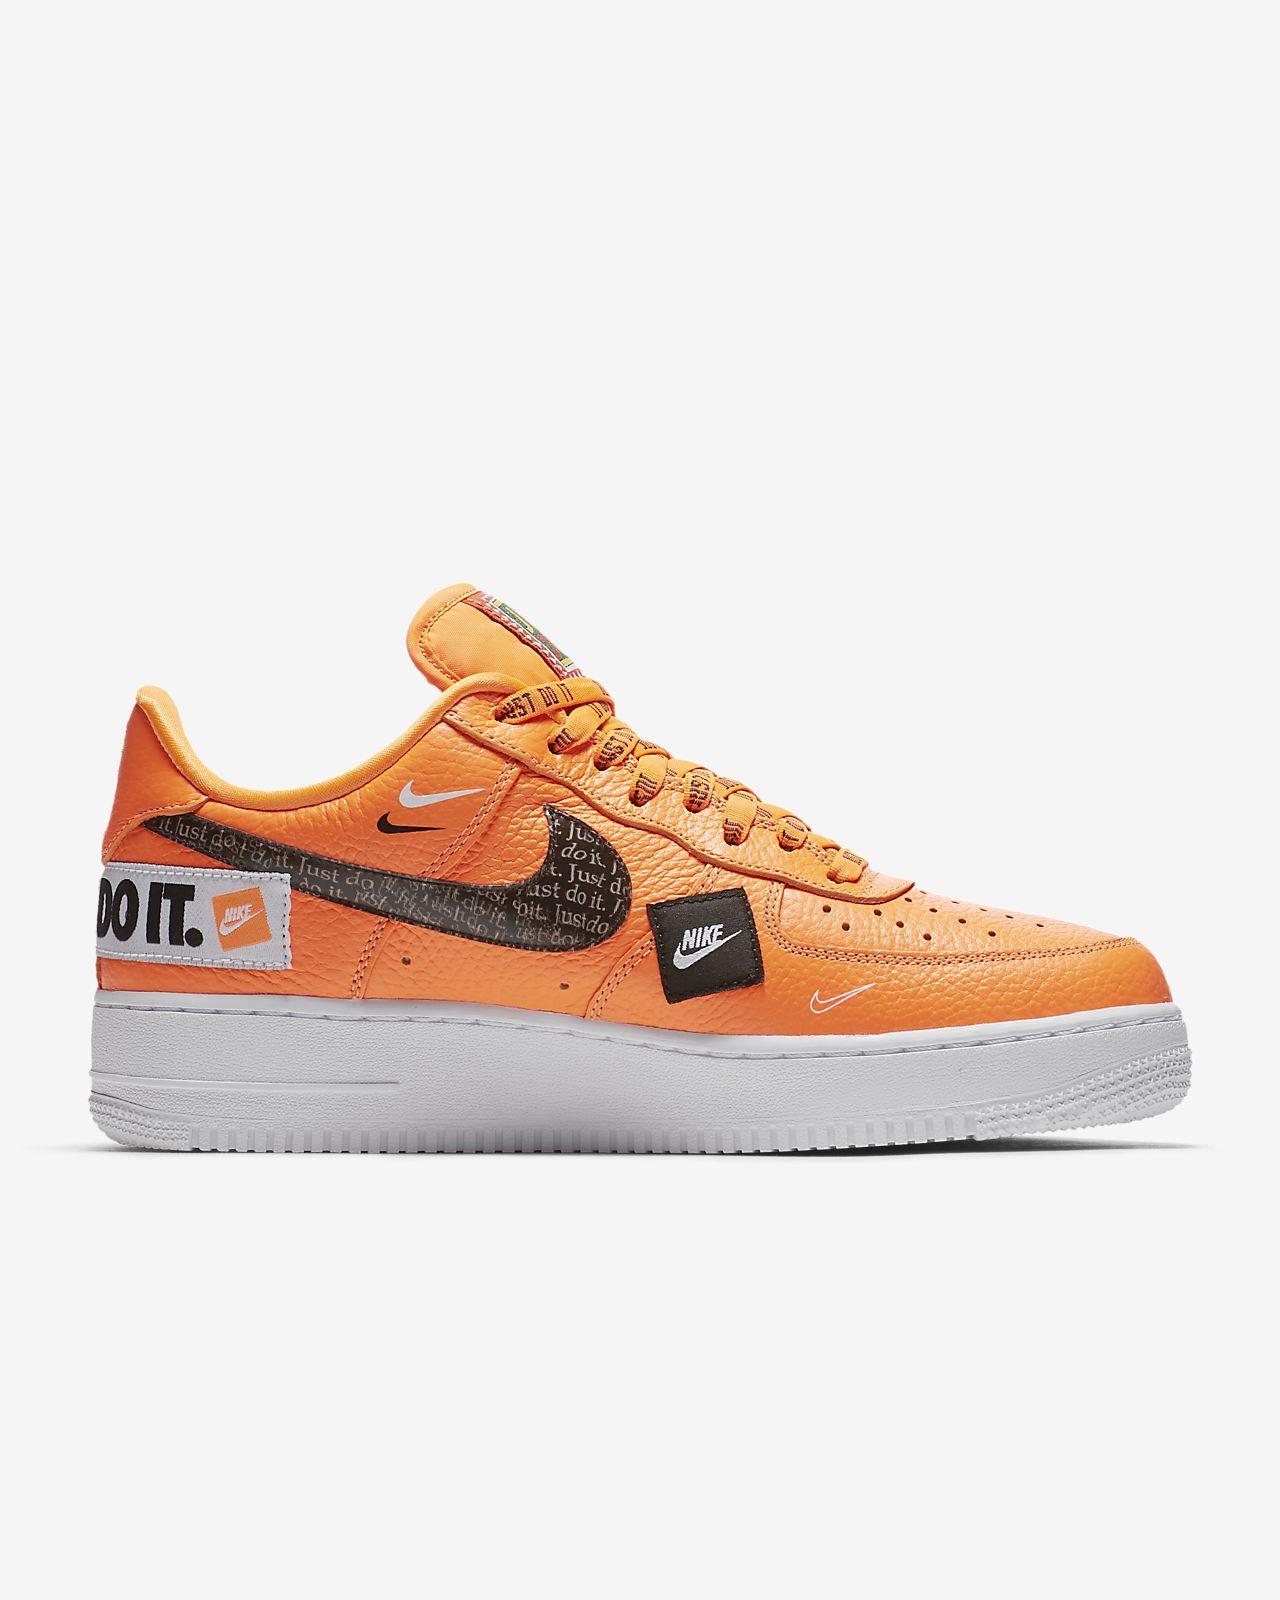 reputable site dde02 7f456 Nike Air Force 1  07 Lv8 JDI, Chaussures de Gymnastique Homme, Blanc (